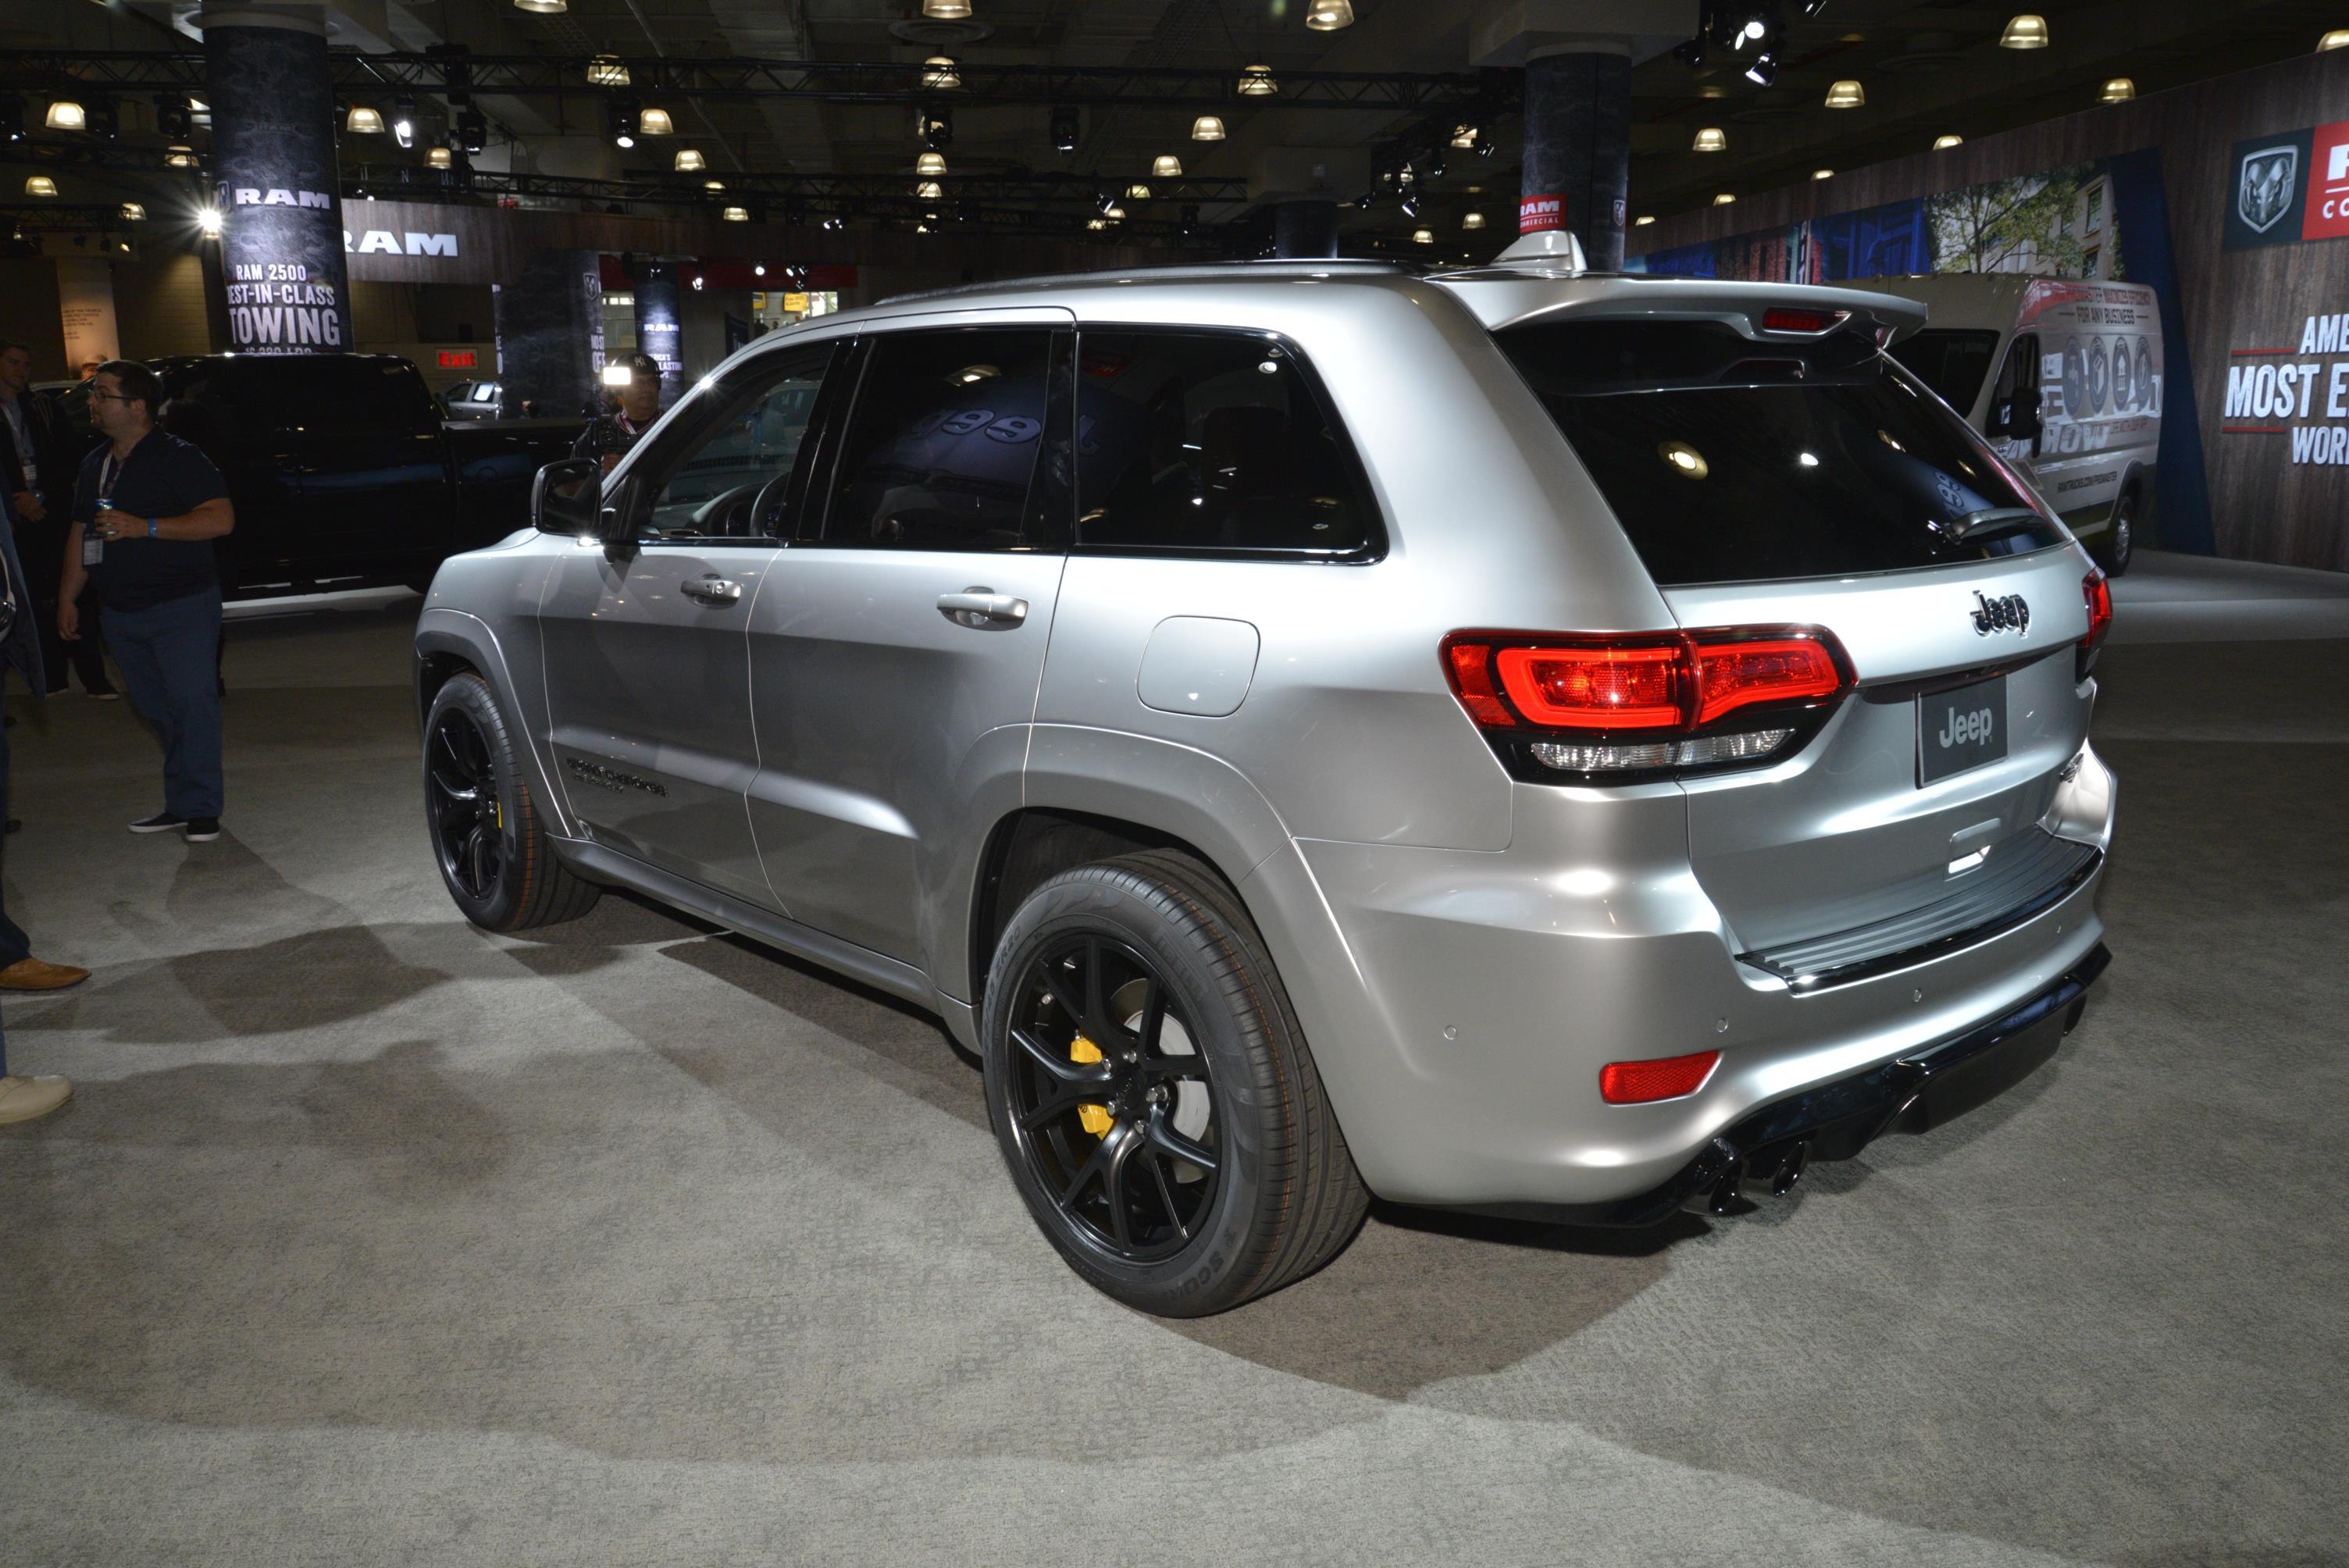 New York Auto Show 2017 (323)